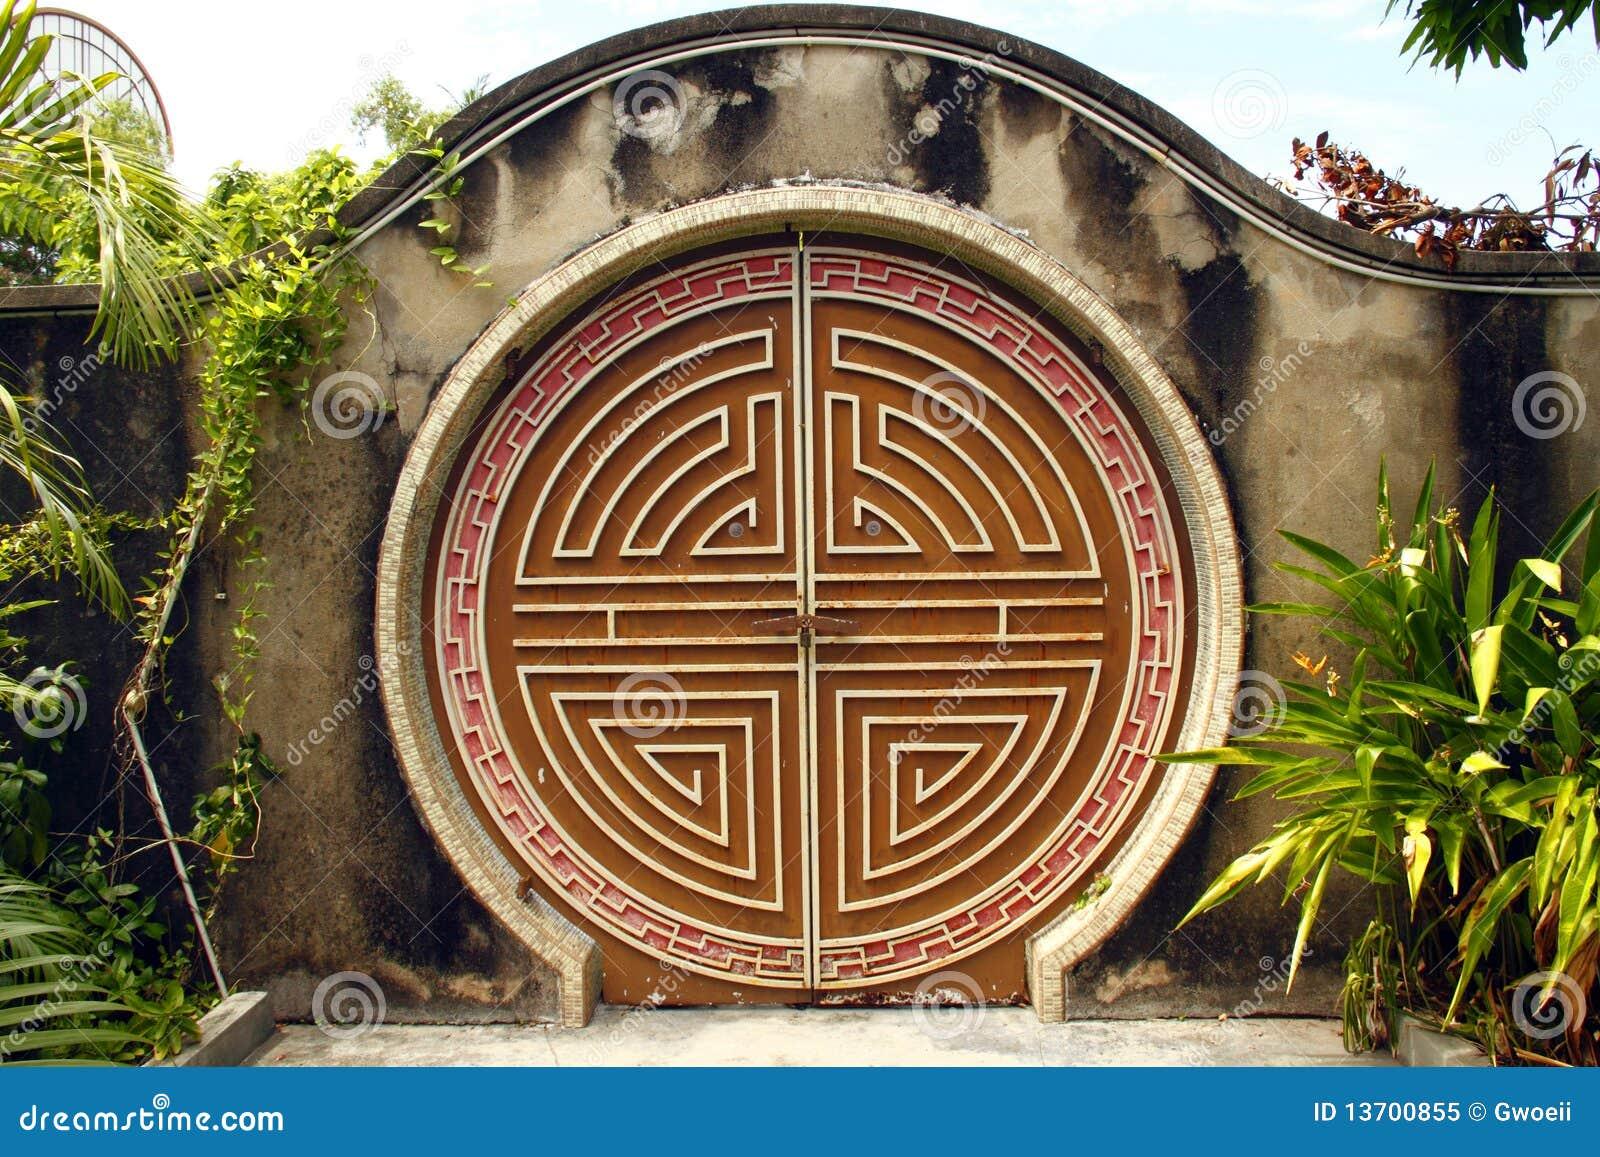 Round Chinese gateway & Round Chinese gateway stock image. Image of movement - 13700855